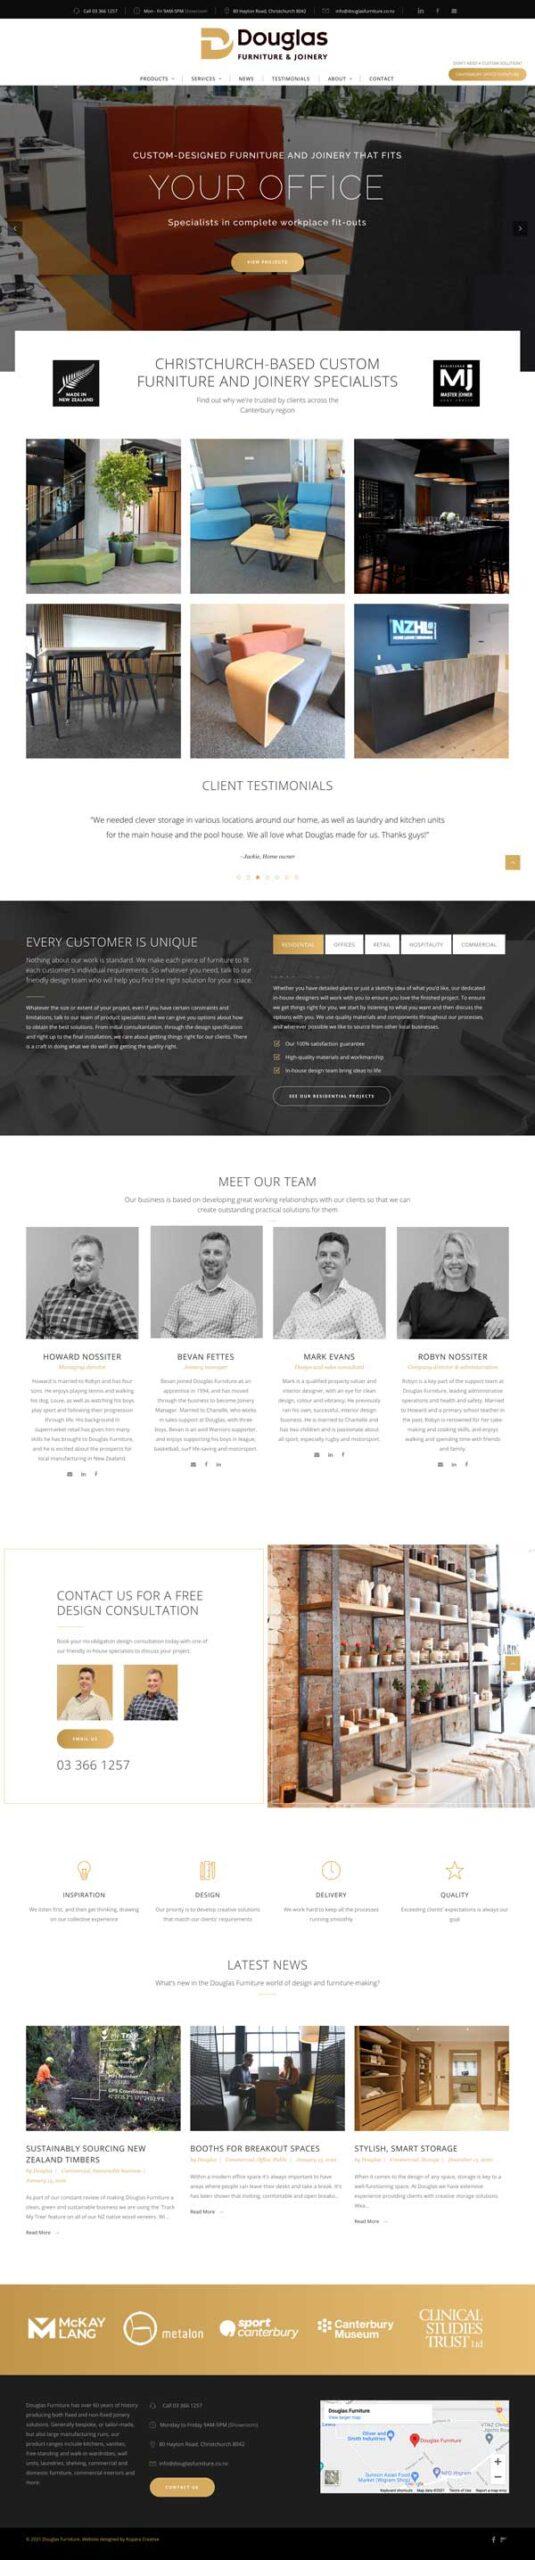 Douglas Furniture New website design and marketig